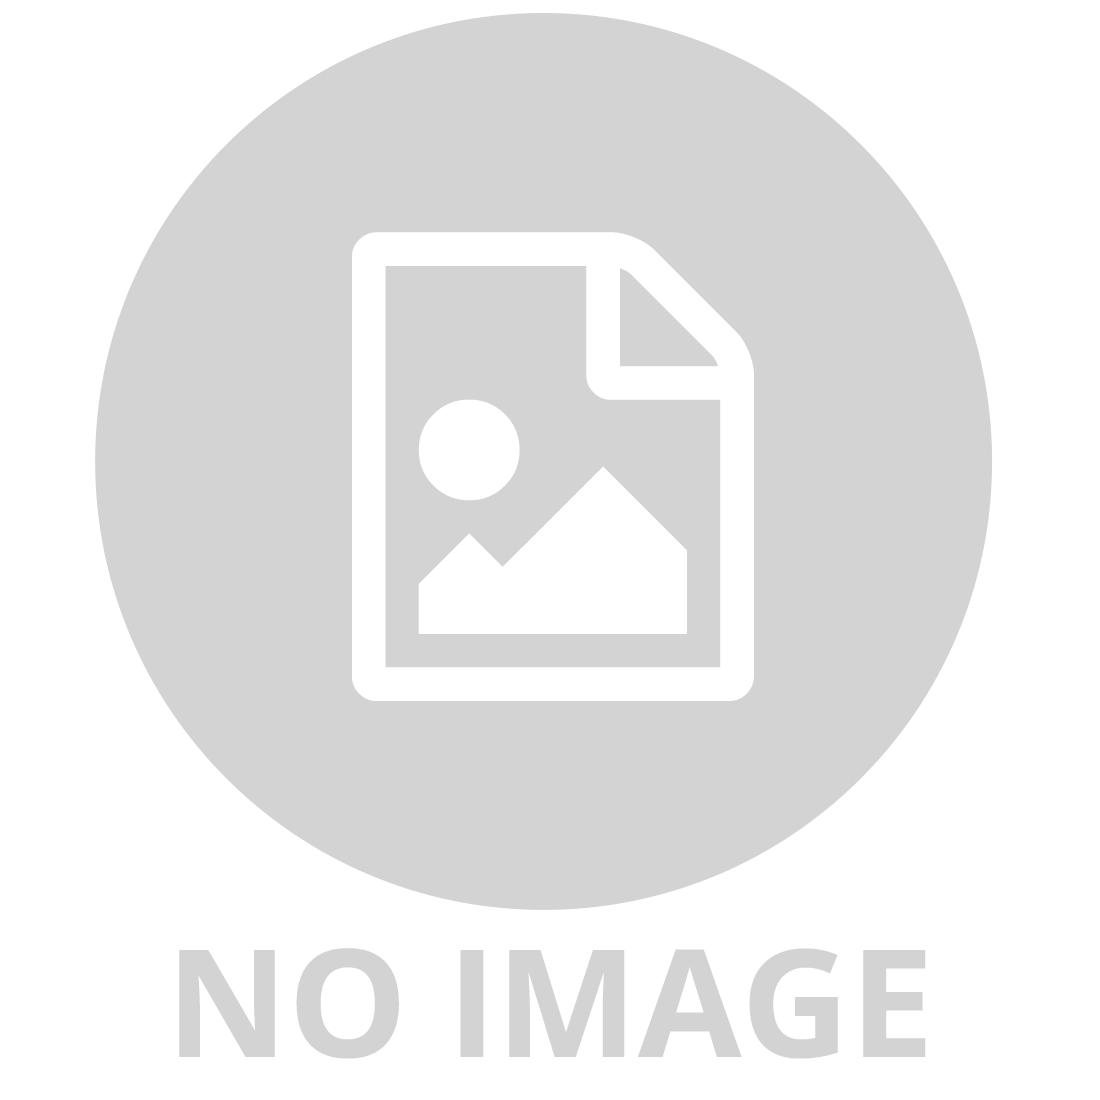 TAMIYA TS 83 METALIC SILVER PAINT